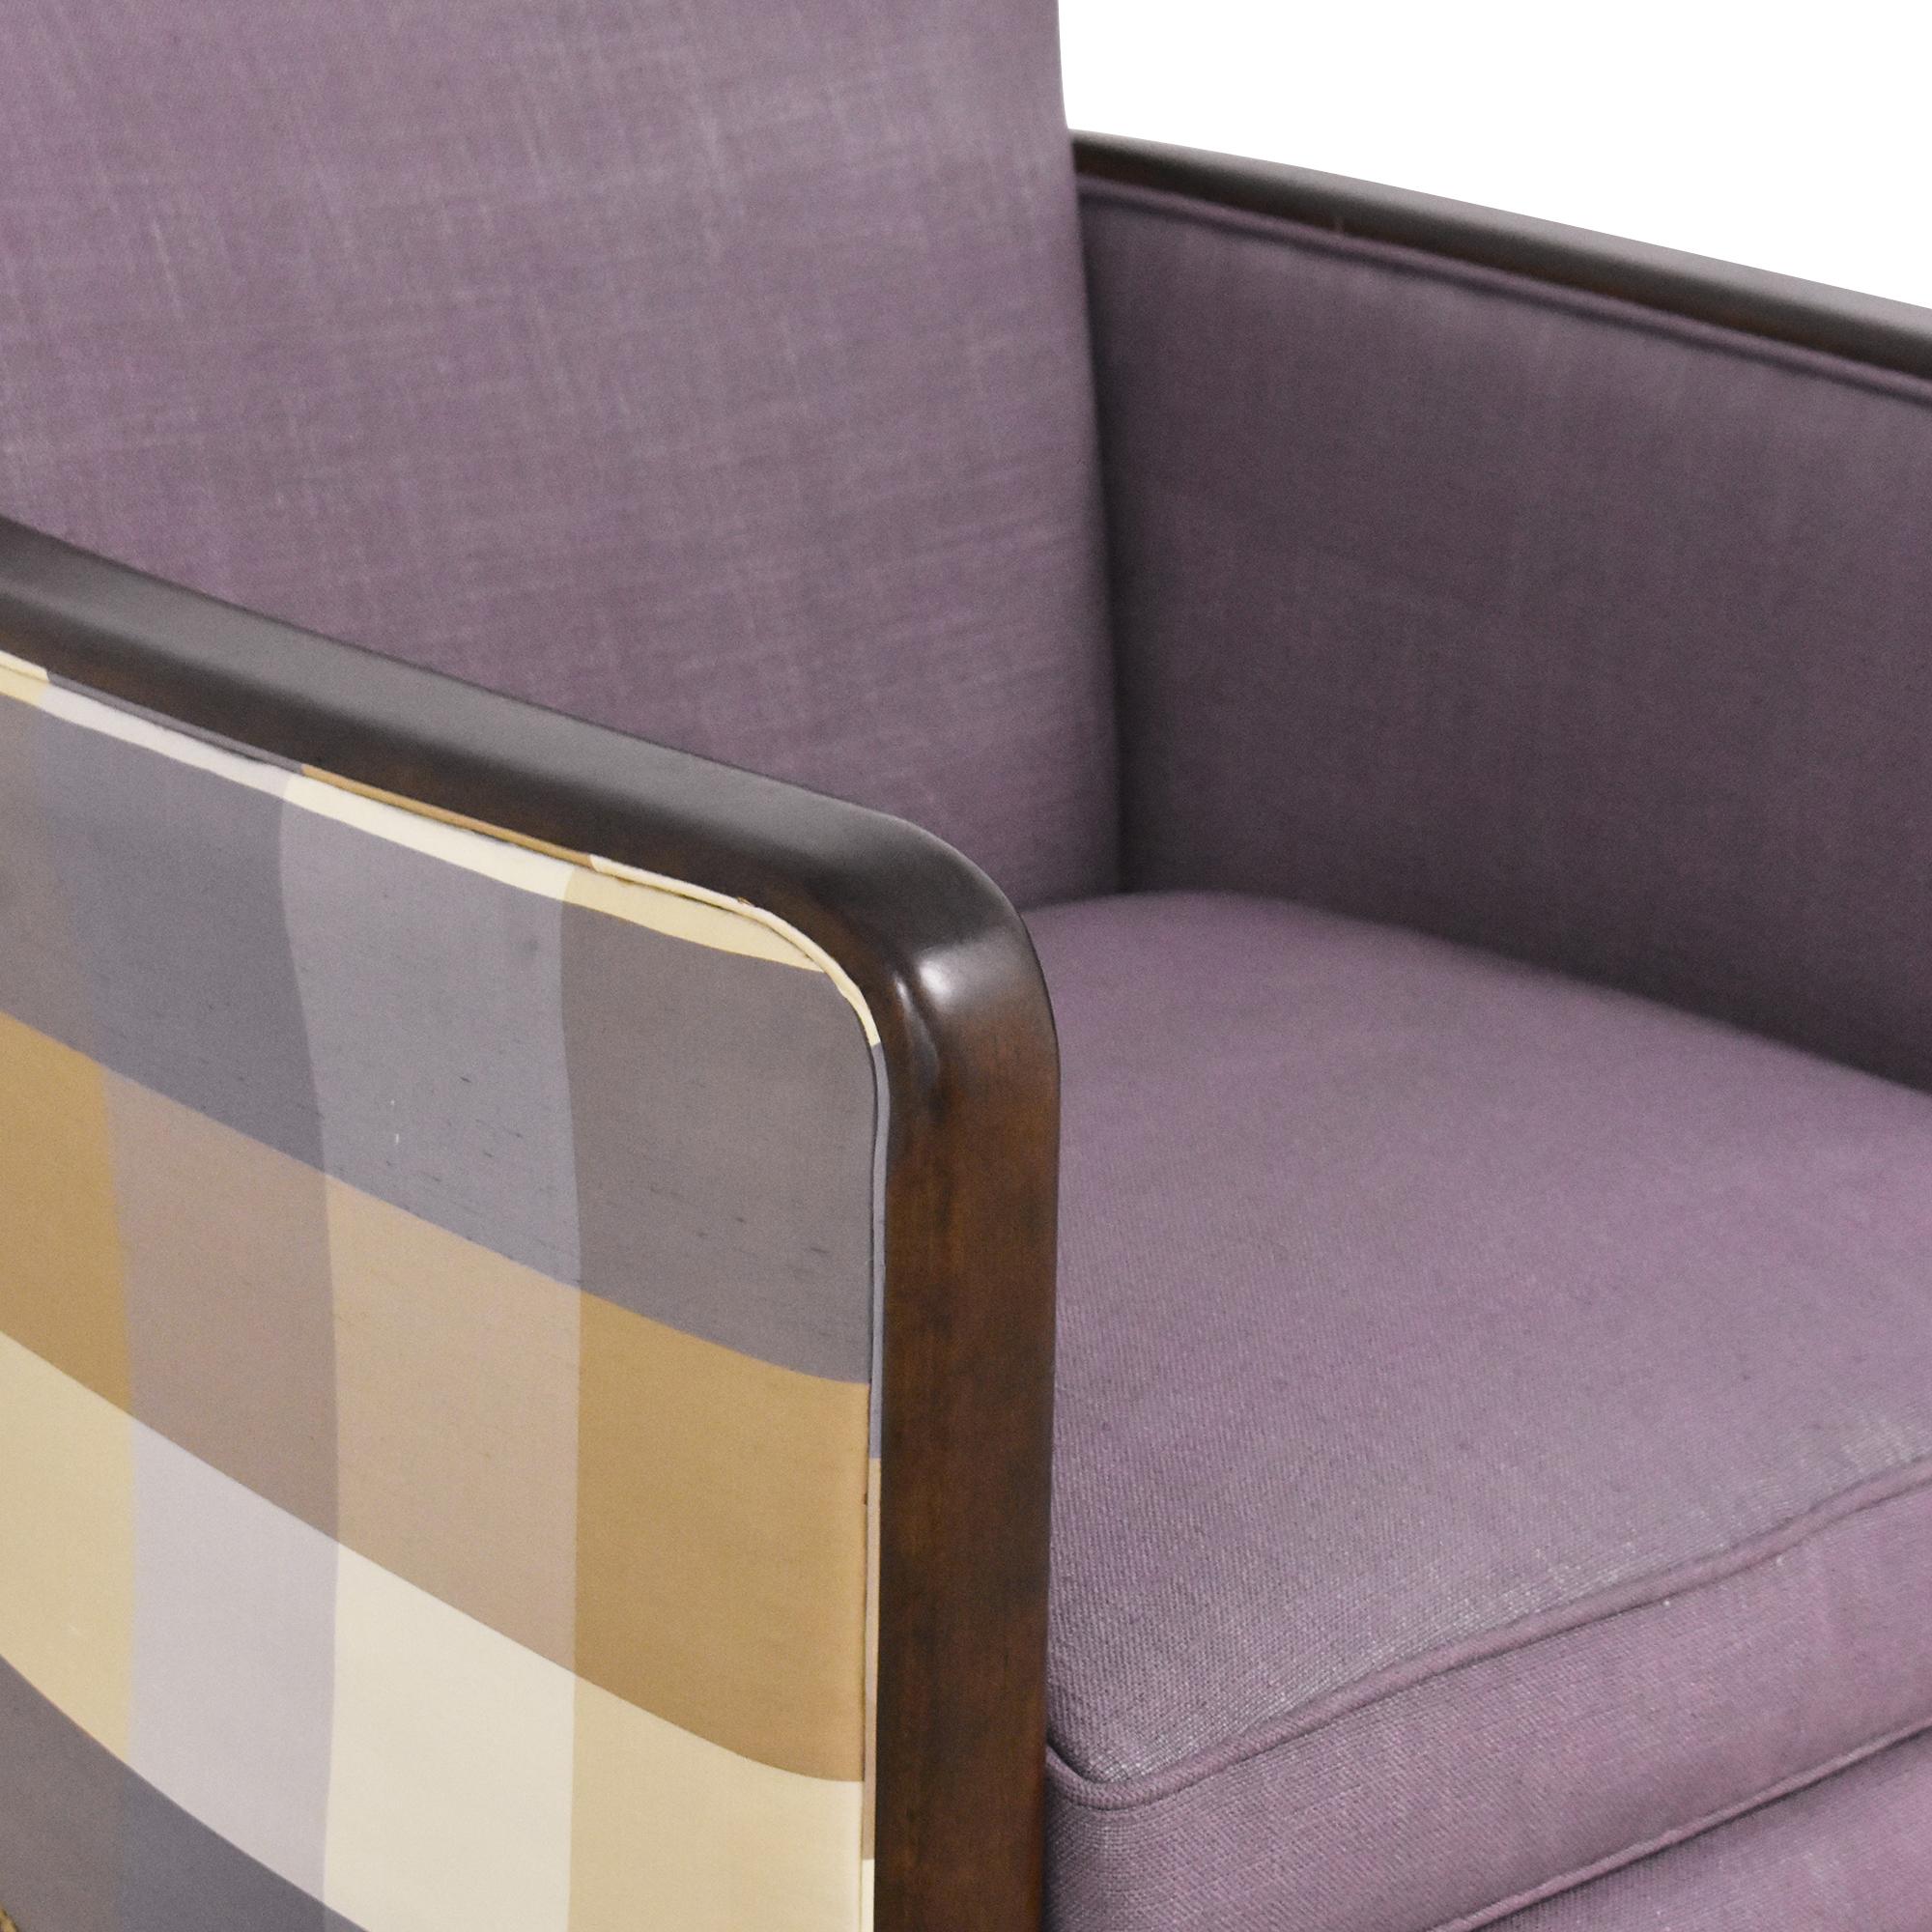 Kravet Kravet Plaid Back Accent Chair coupon